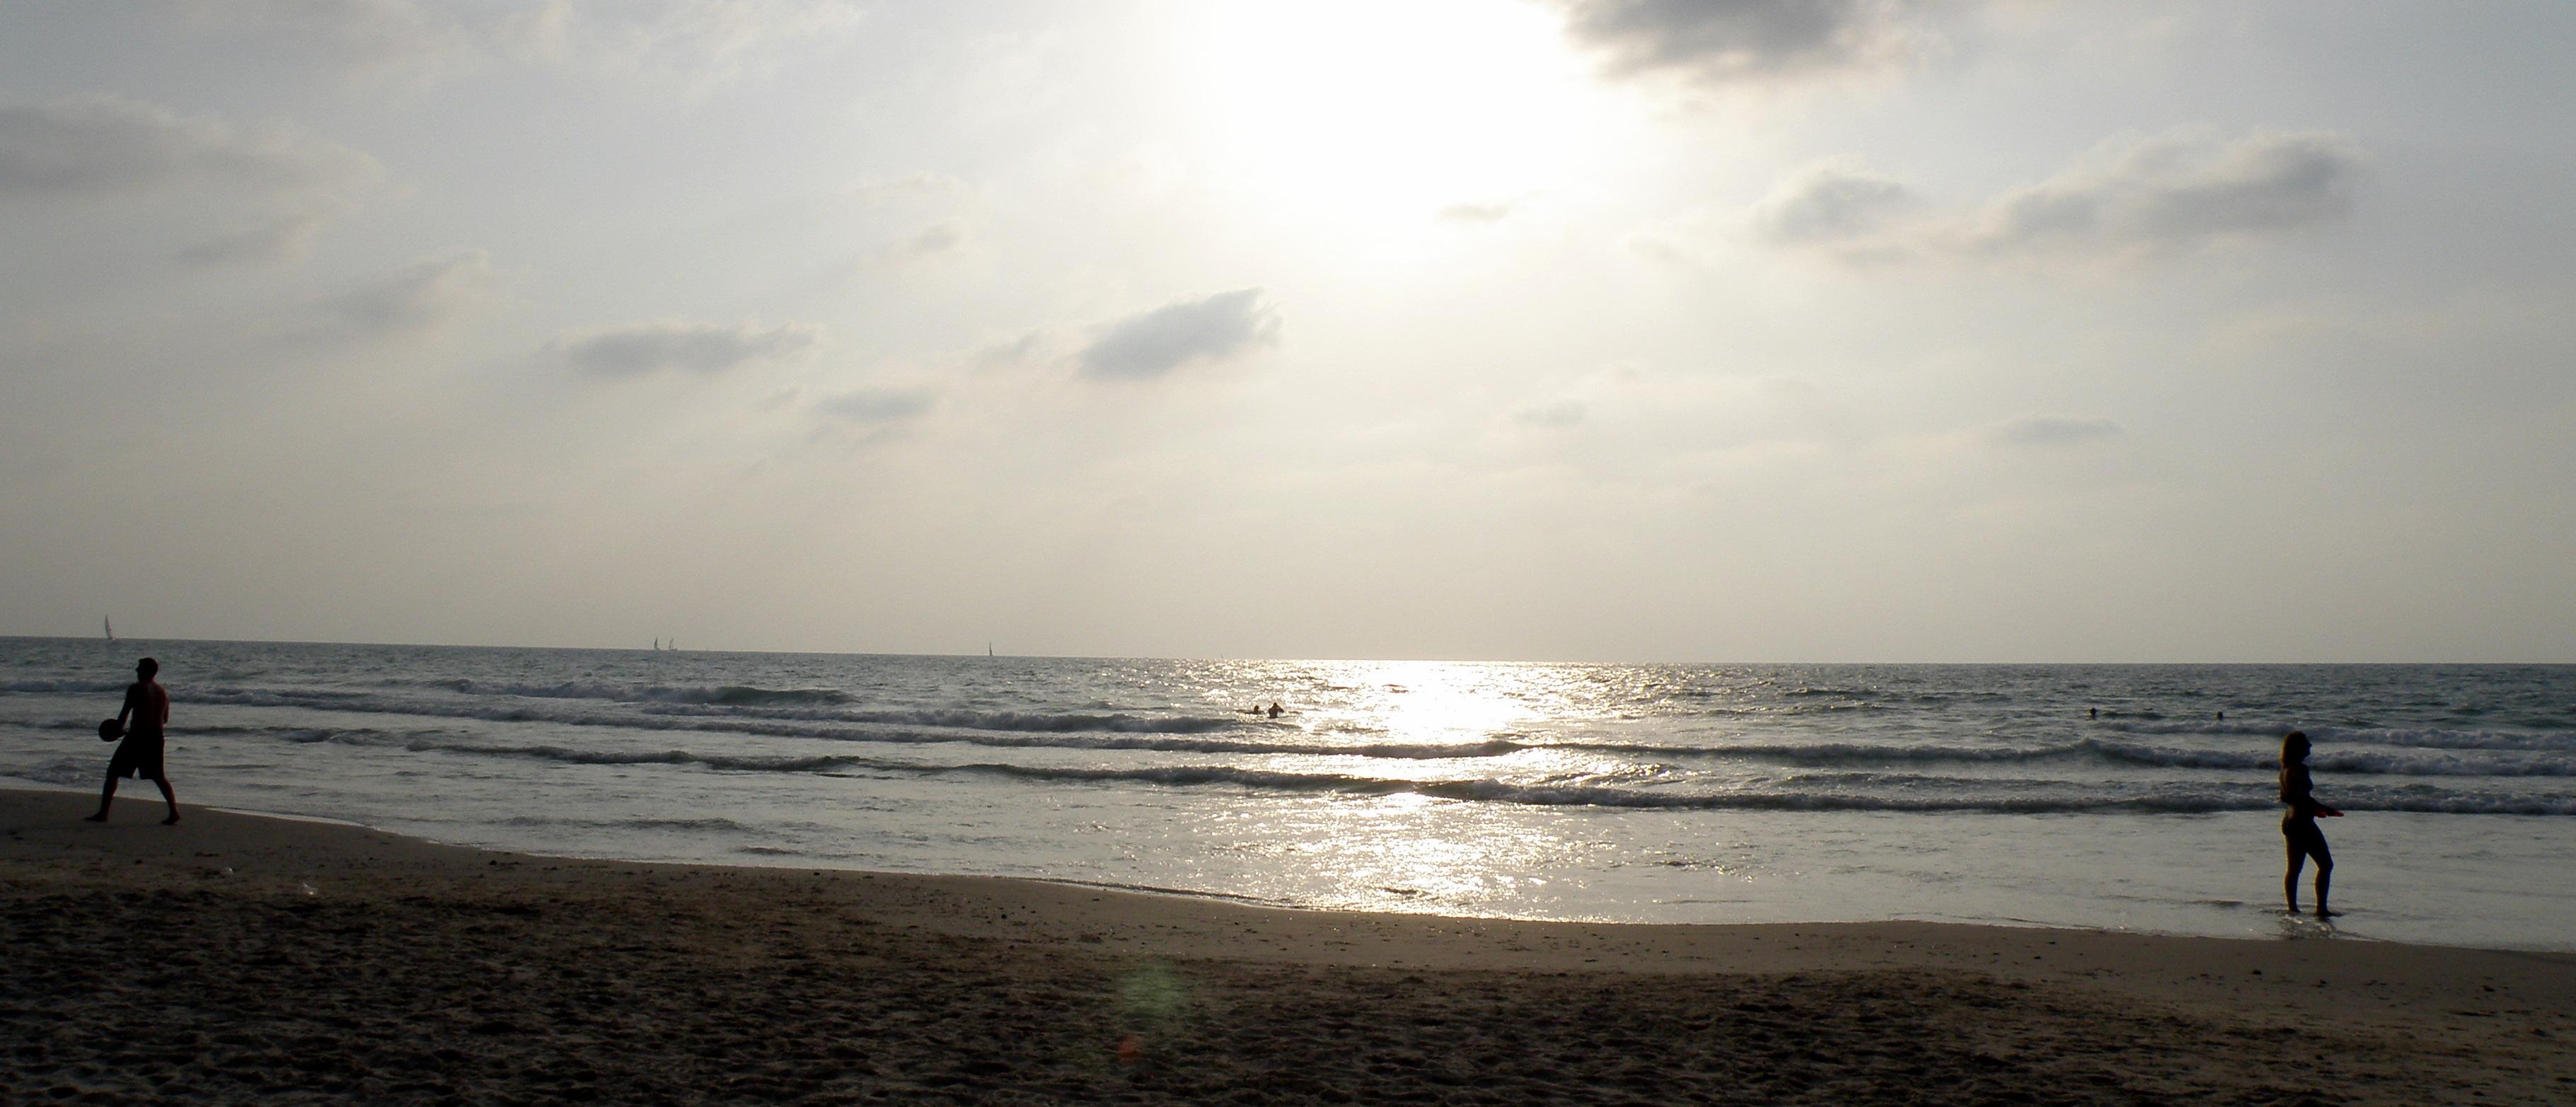 Herzliya Israel  city pictures gallery : Herzliya Beach, Israel | Flickr Photo Sharing!